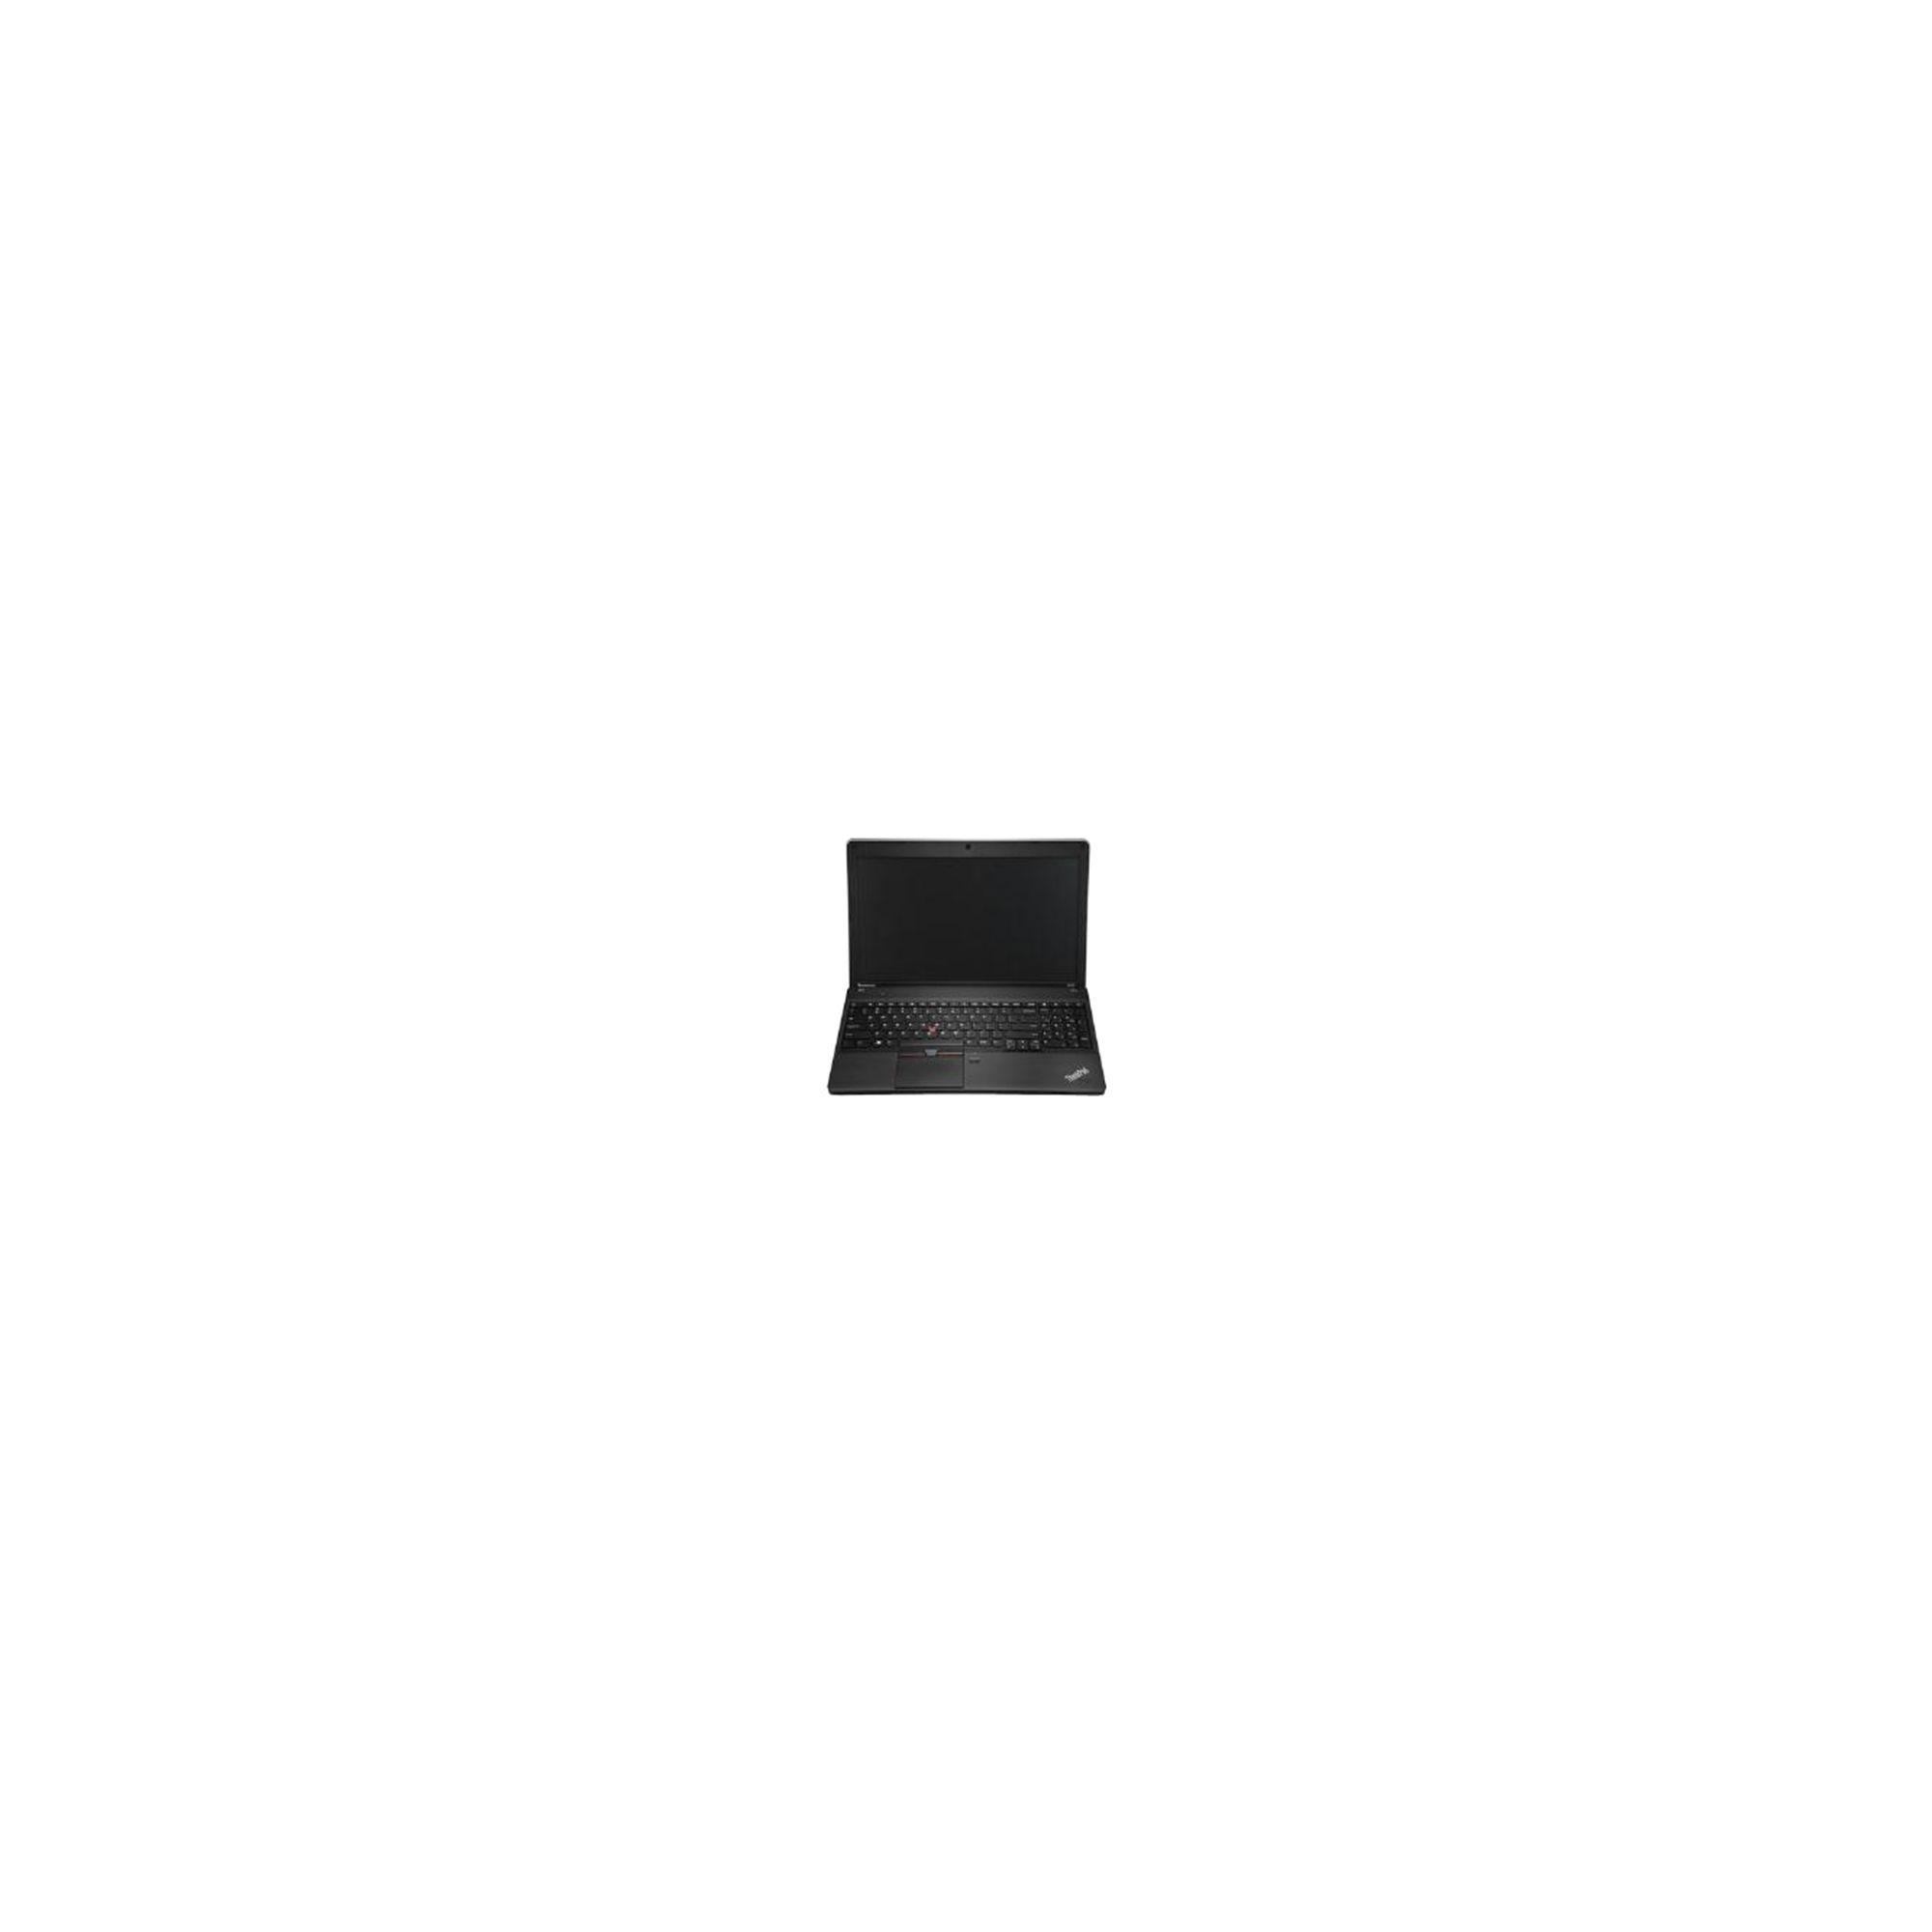 Lenovo ThinkPad Edge E530 3259M9G (15.6 inch) Notebook Core i7 (3632QM) 2.2GHz 4GB 500GB DVD±RW WLAN BT Webcam Windows 8 Pro (Intel HD Graphics) Black at Tesco Direct